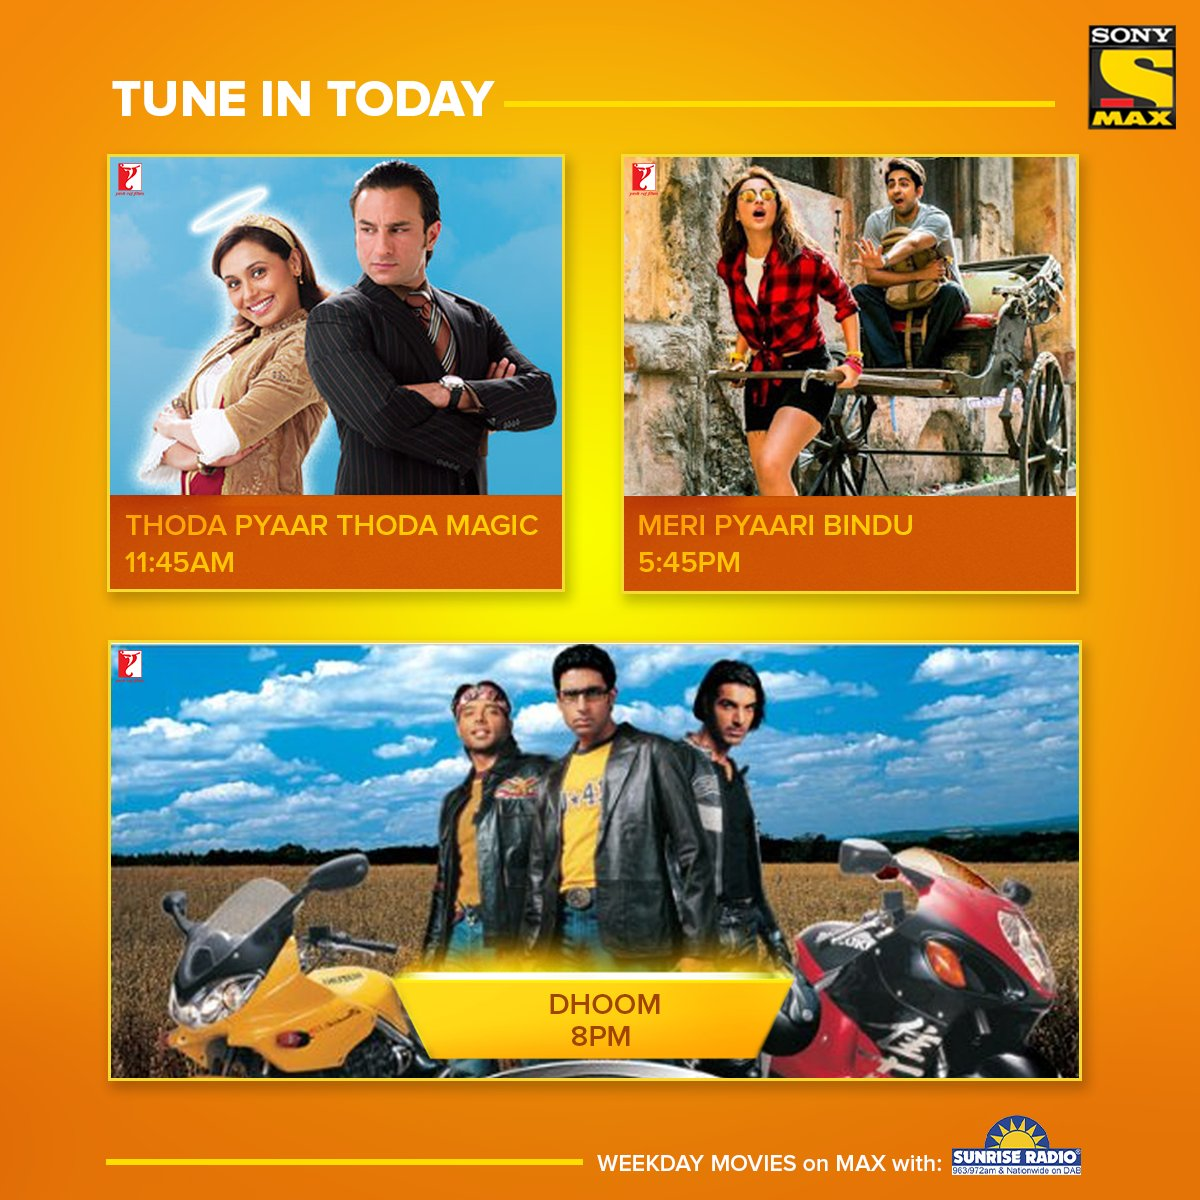 What's your #FridayFeeling?  Pick from some magic, action and romance!  #SonyMAXUK  #MAXUK #BollywoodMovies #Bollywood #BollywoodActor #Bollywood #ThodaPyaarThodaMagic #MeriPyaariBindu #Dhoom